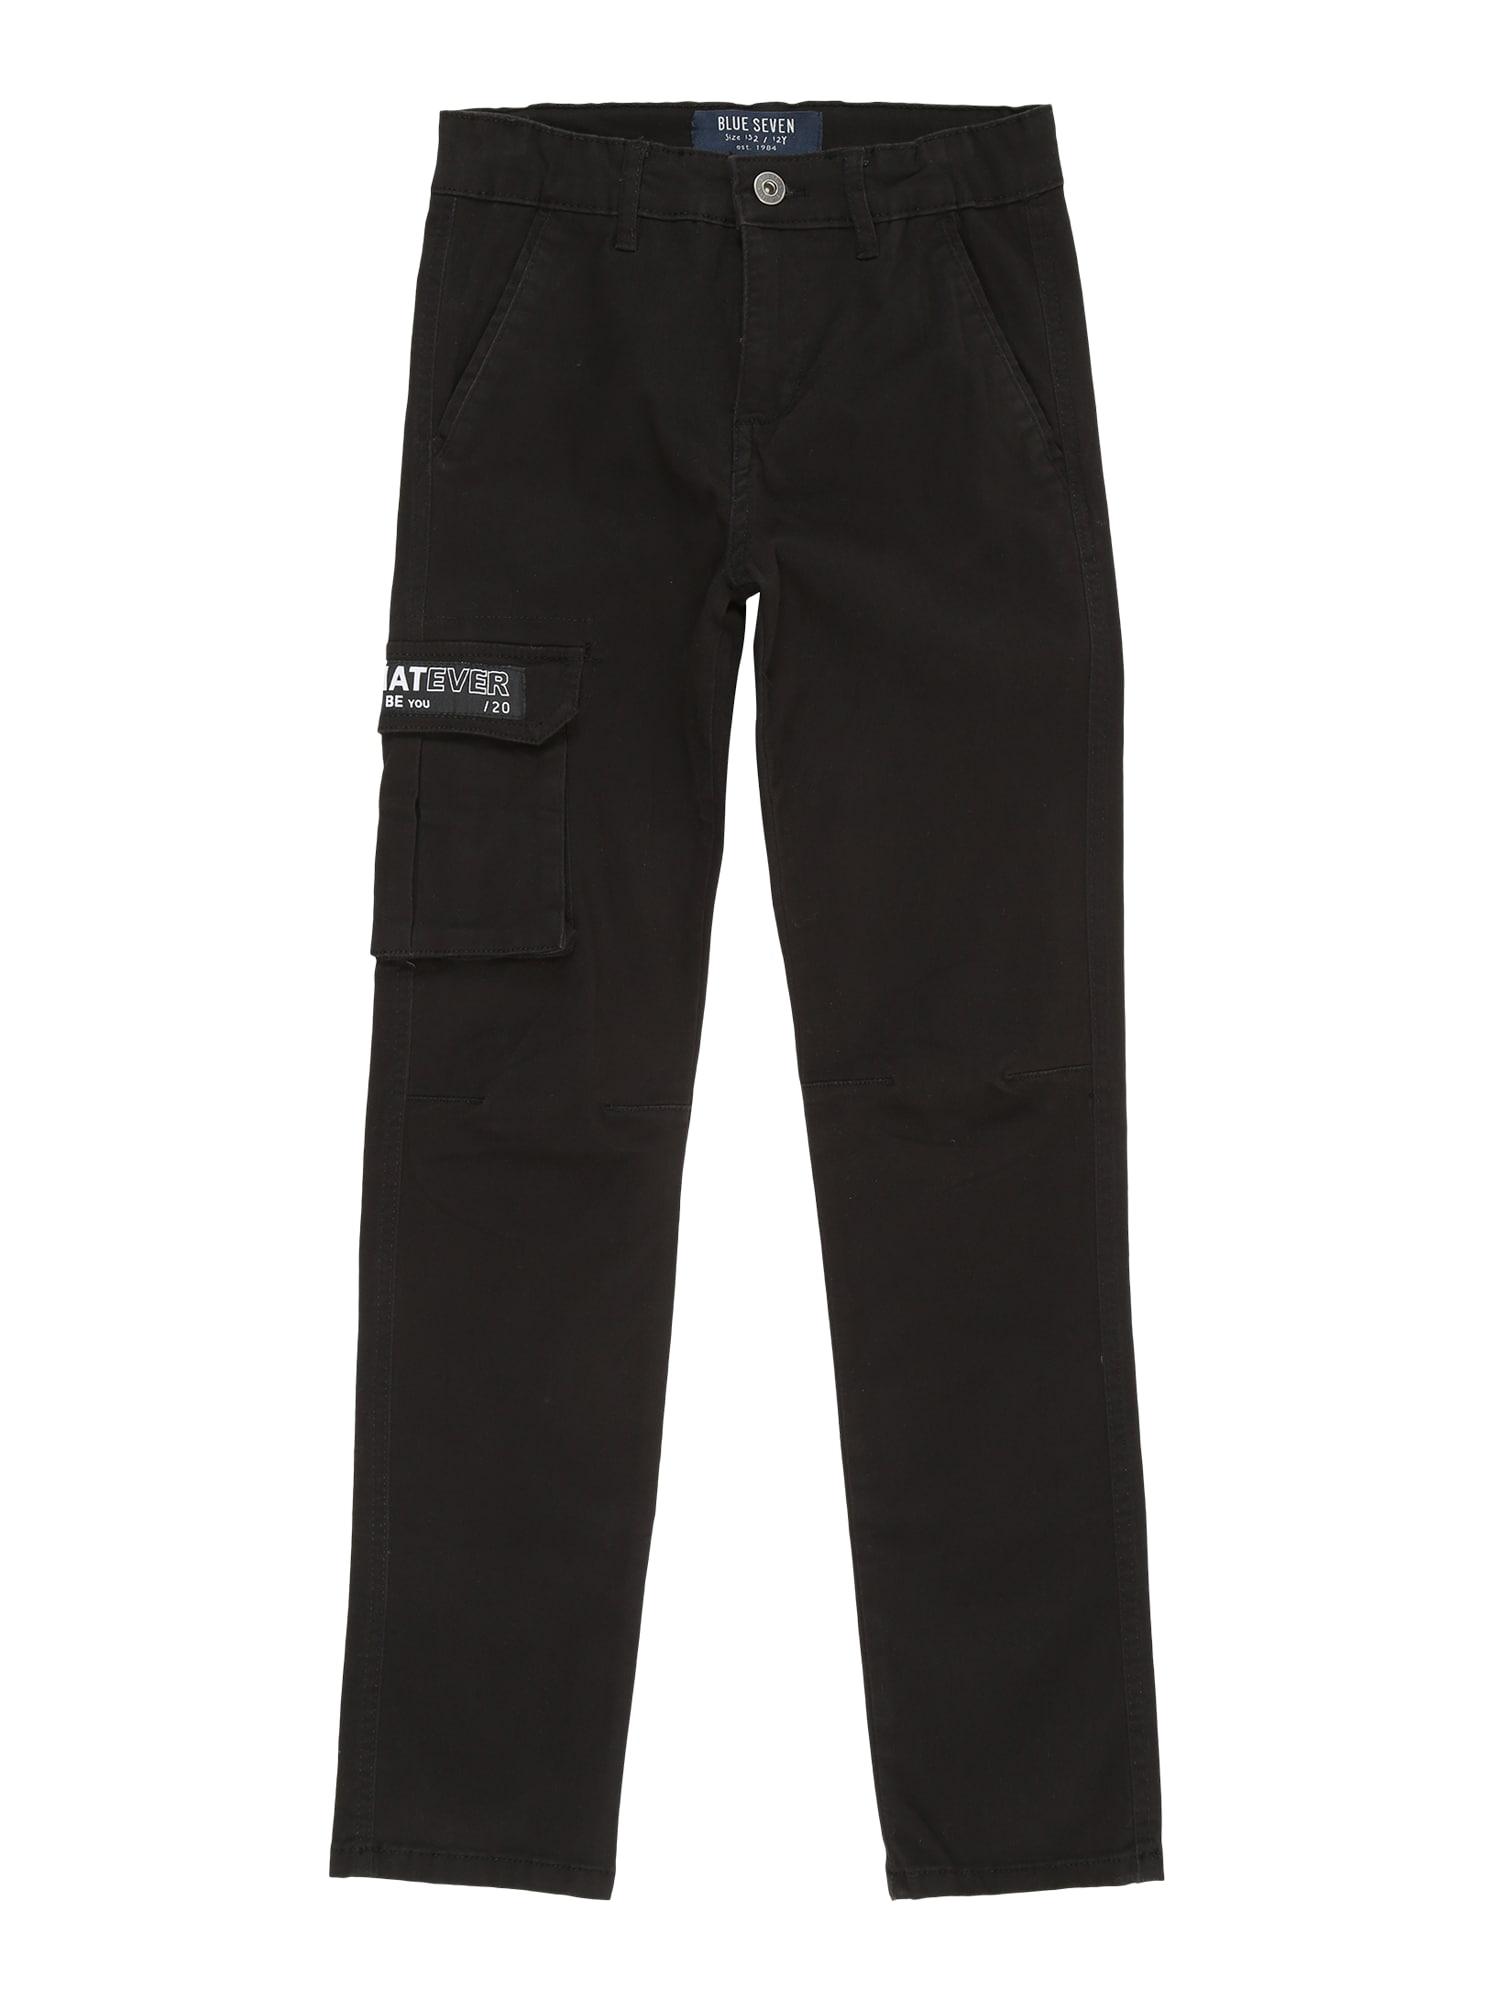 BLUE SEVEN Kelnės juoda / balta